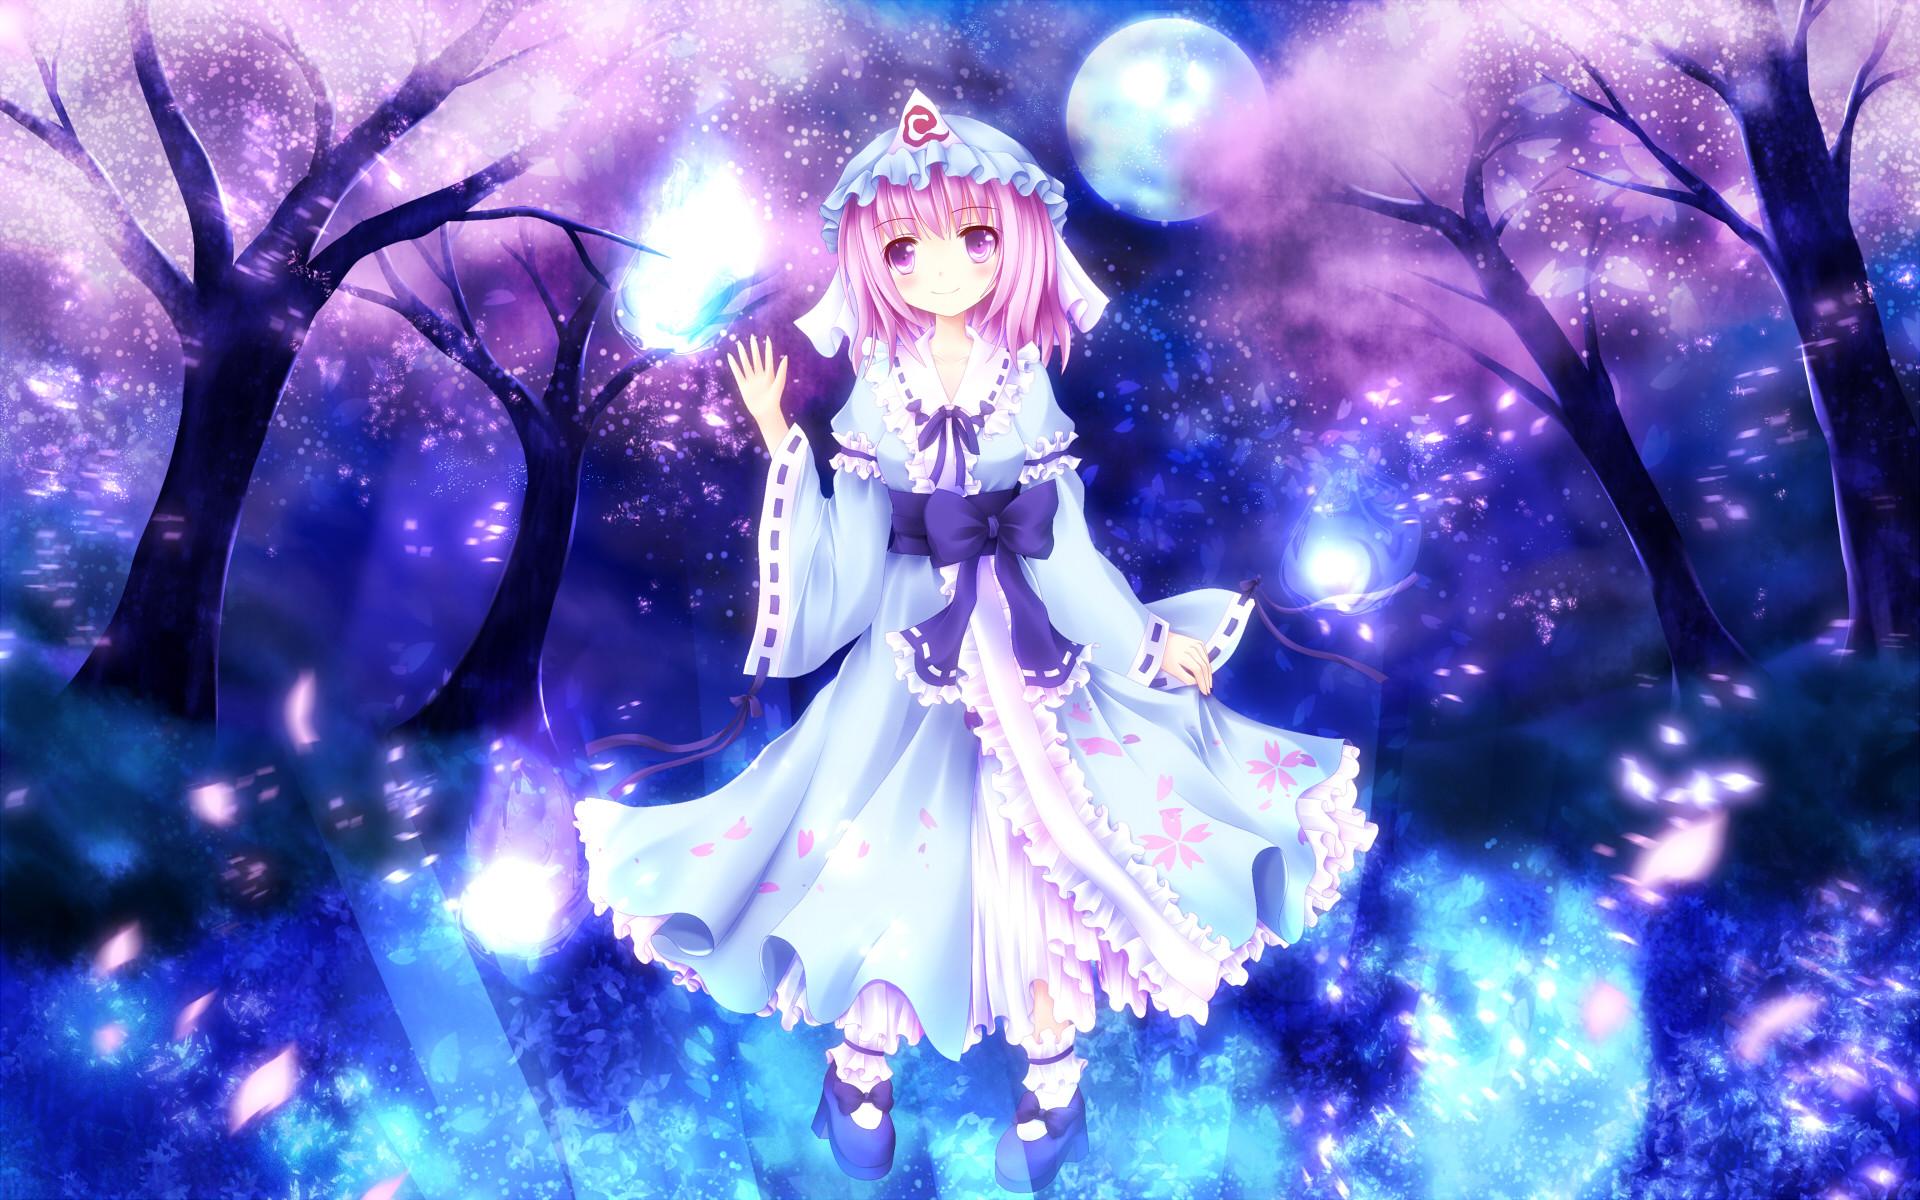 Anime – Touhou Yuyuko Saigyouji Pink Hair Purple Eyes Dress MÃ¥nen Japanese  Clothes Bakgrund